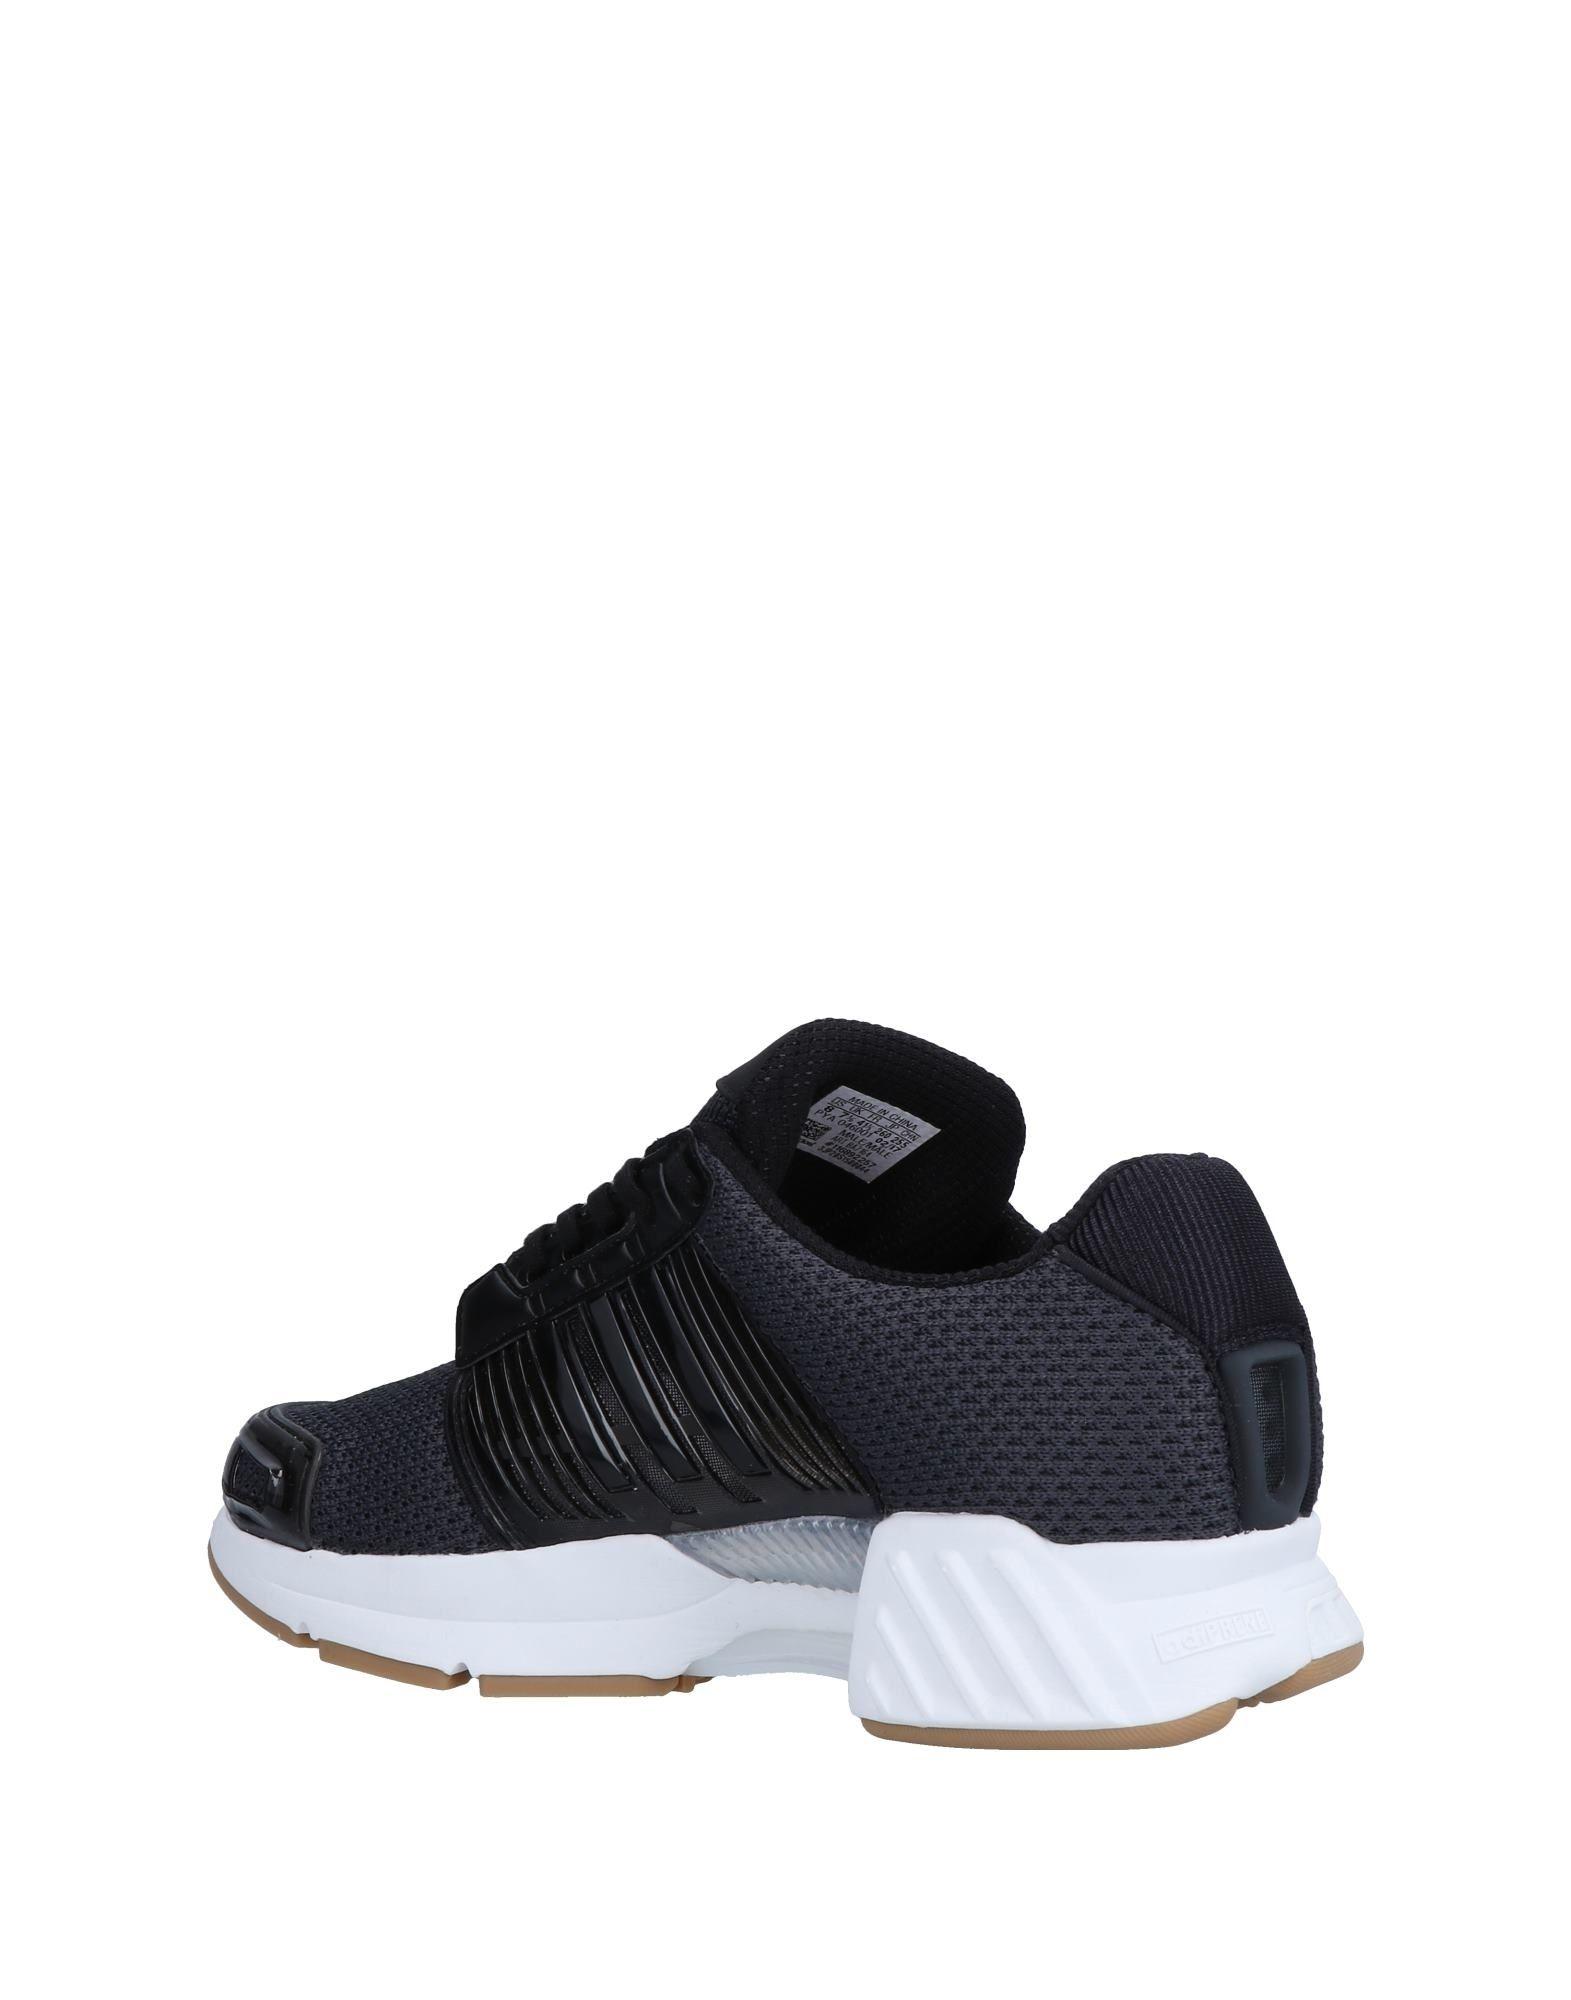 Sneakers Adidas Originals 11521184PN Uomo - 11521184PN Originals fb7b35